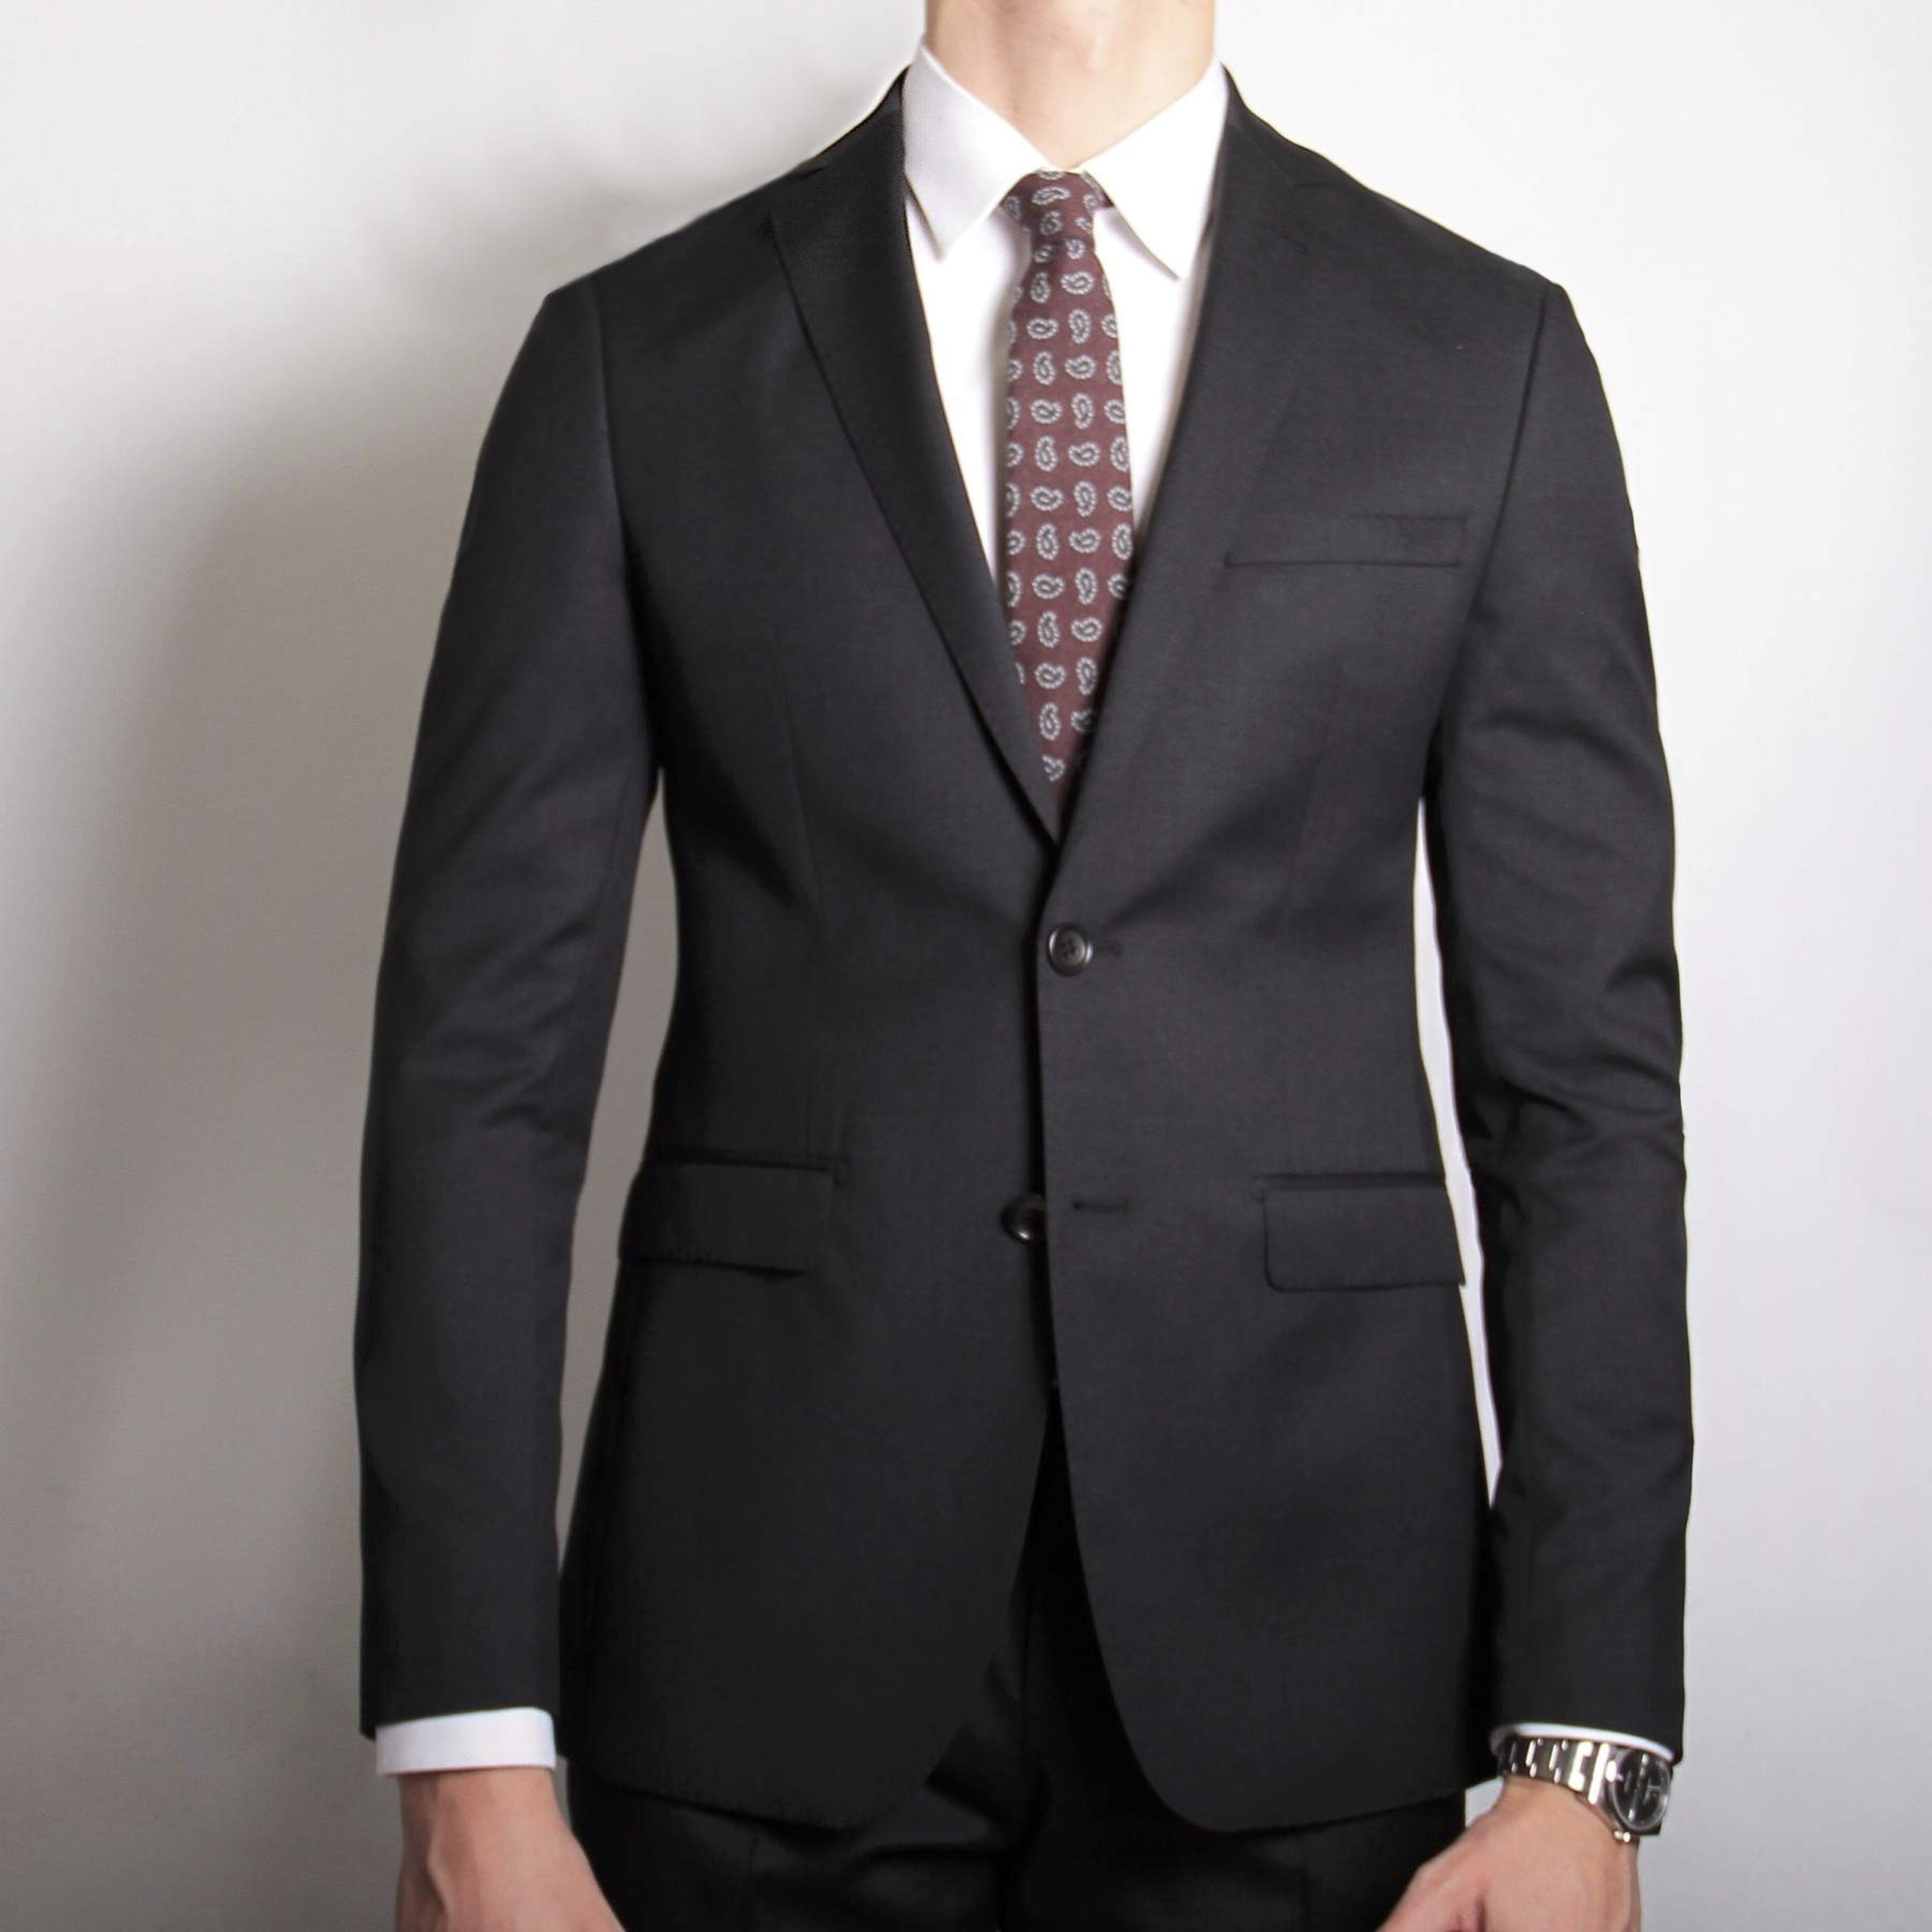 Costume gris anthracite - Doublure bordeaux - Slim-Fit - Pure Laine - Tissu Canonico 110's (Suits)